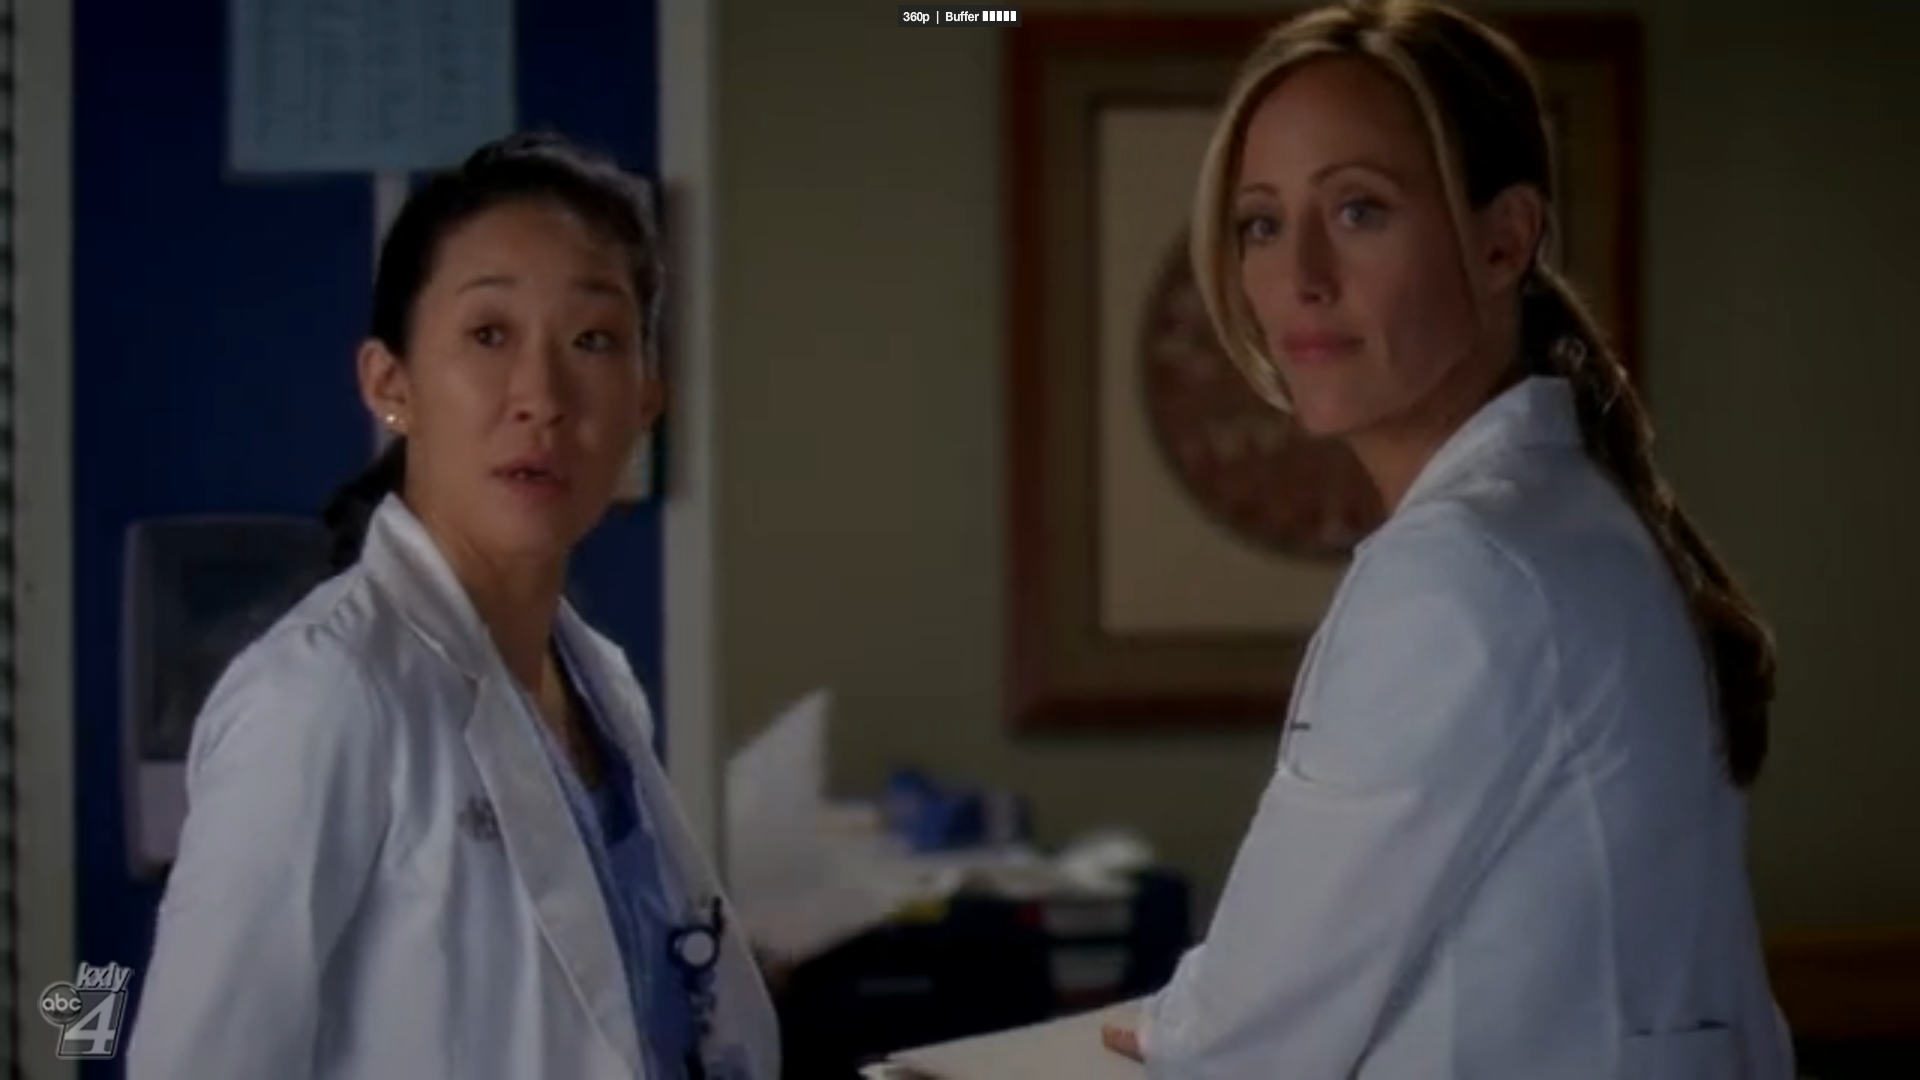 Grey's Anatomy Recap: Season 8, Episode 1 (Free Falling She's Gone)